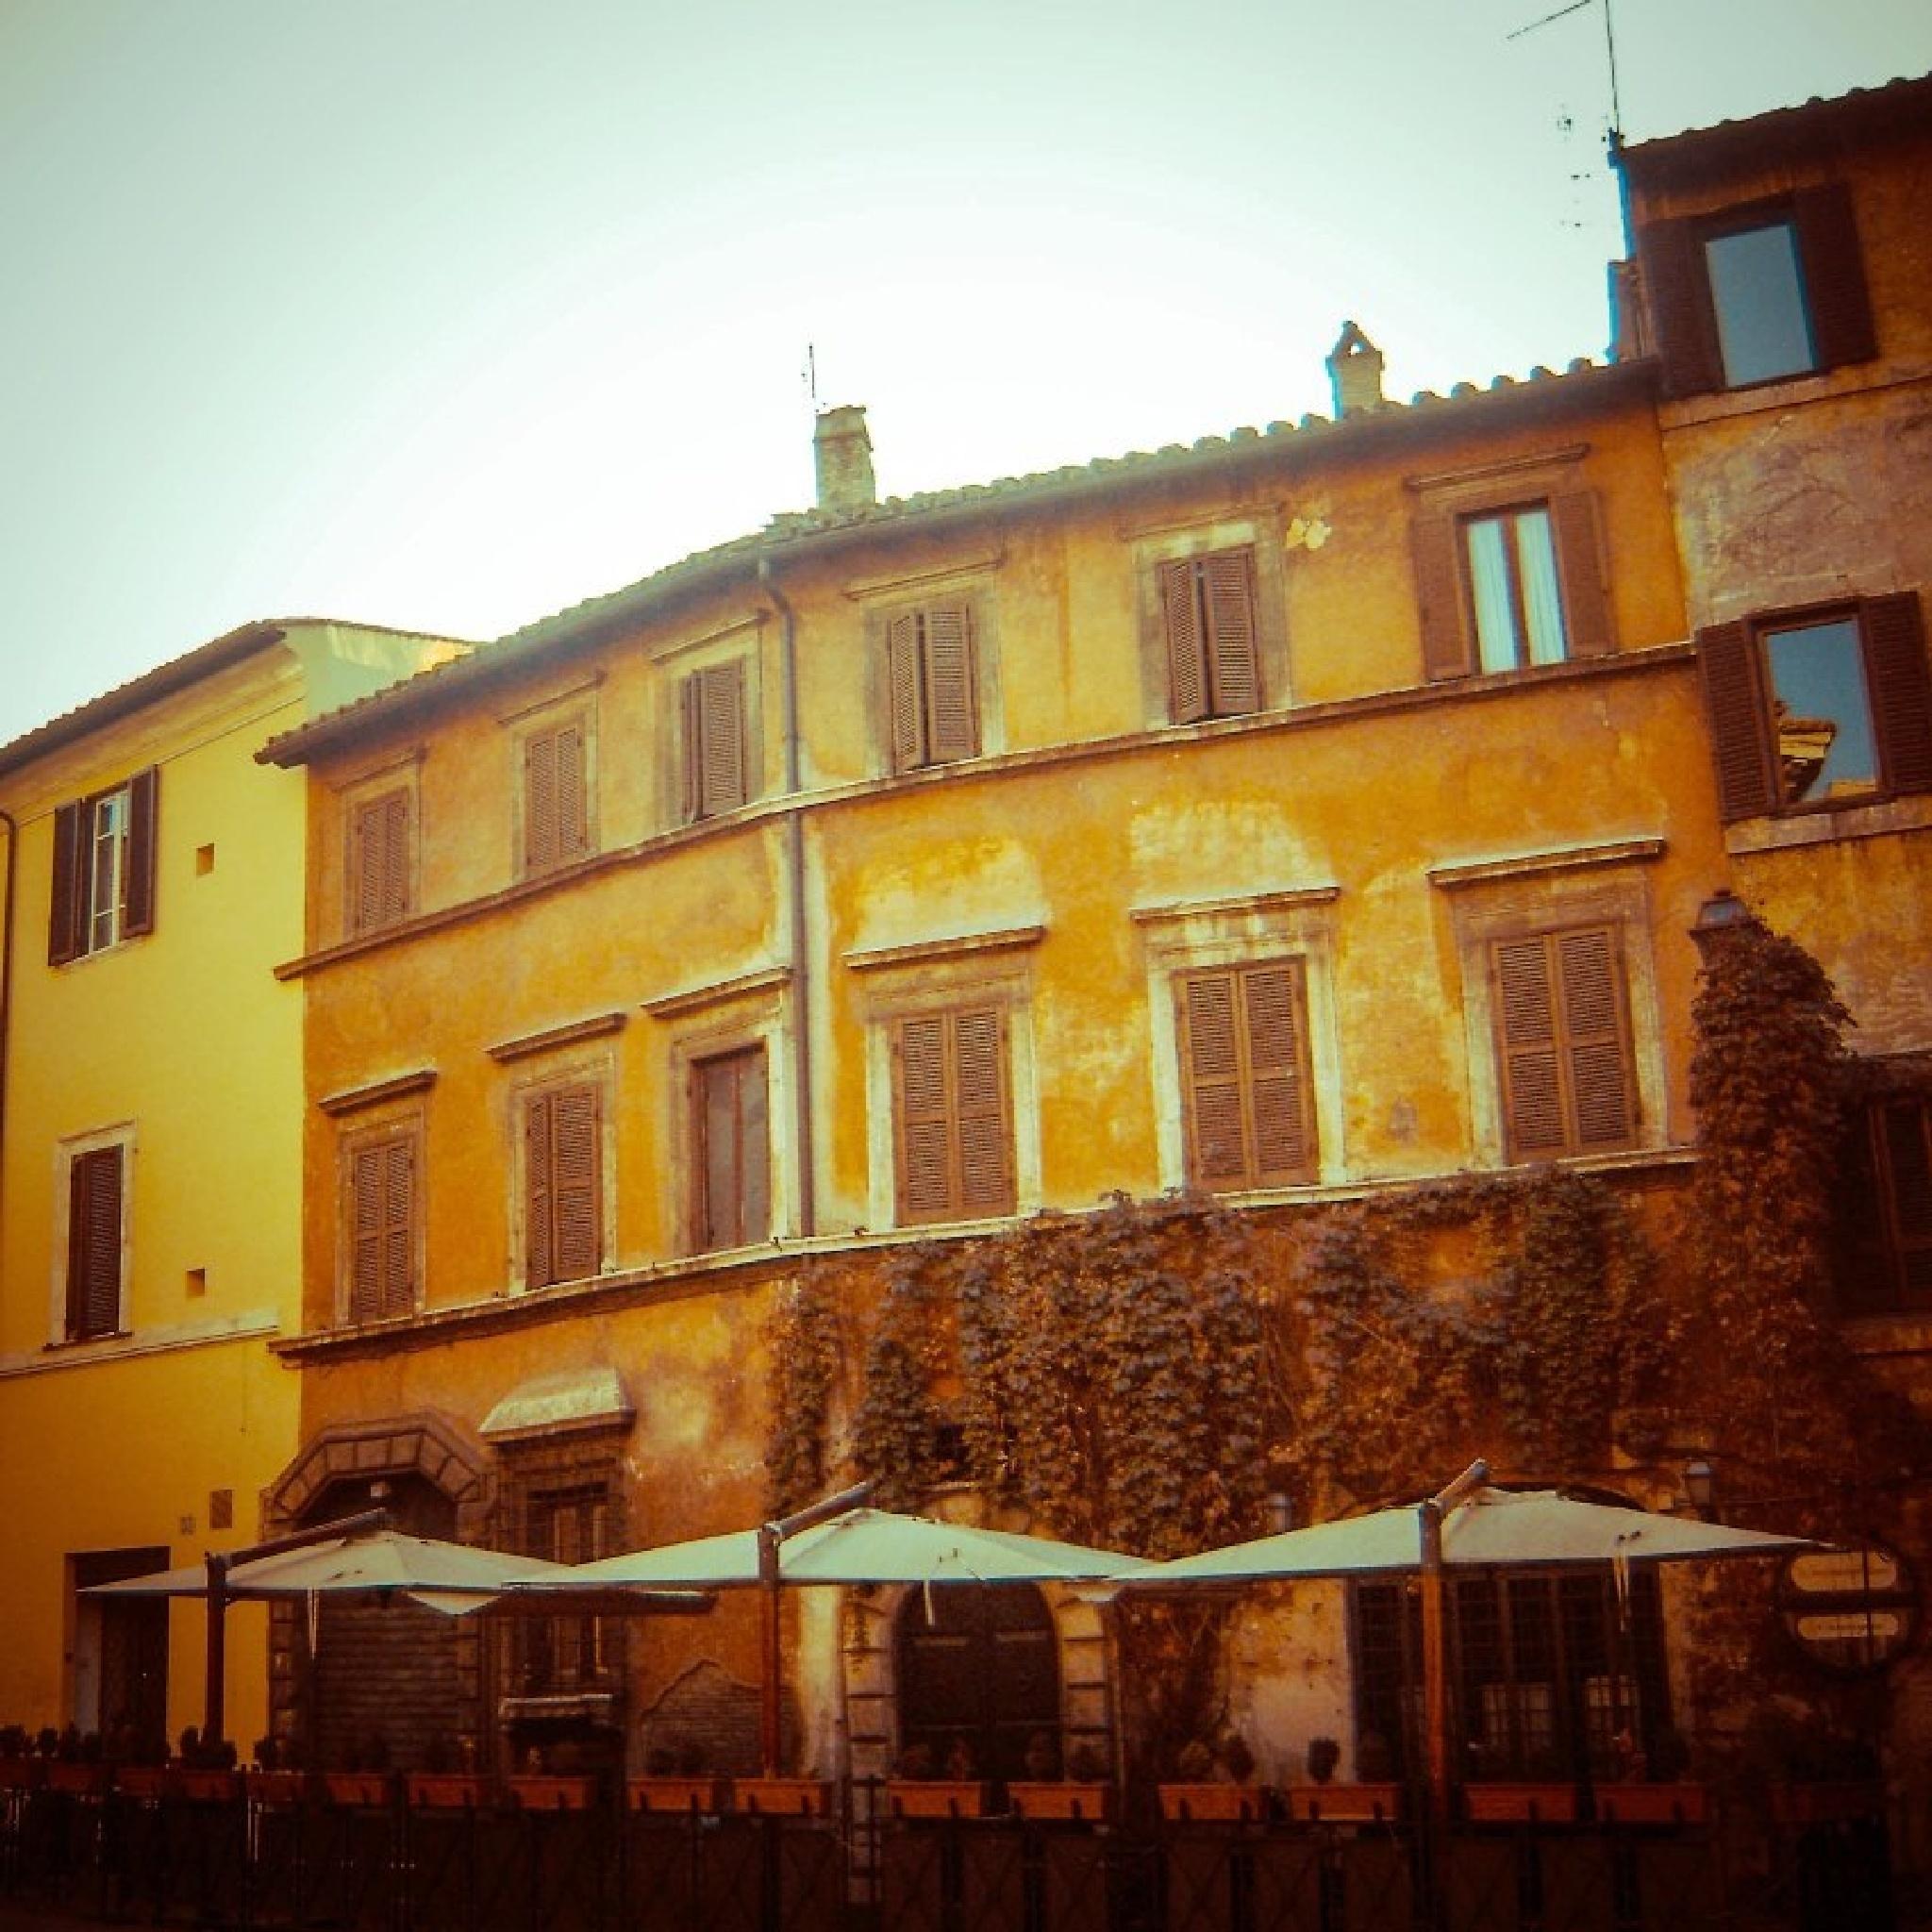 Italia - Rome - 4 by Emre YALÇIN